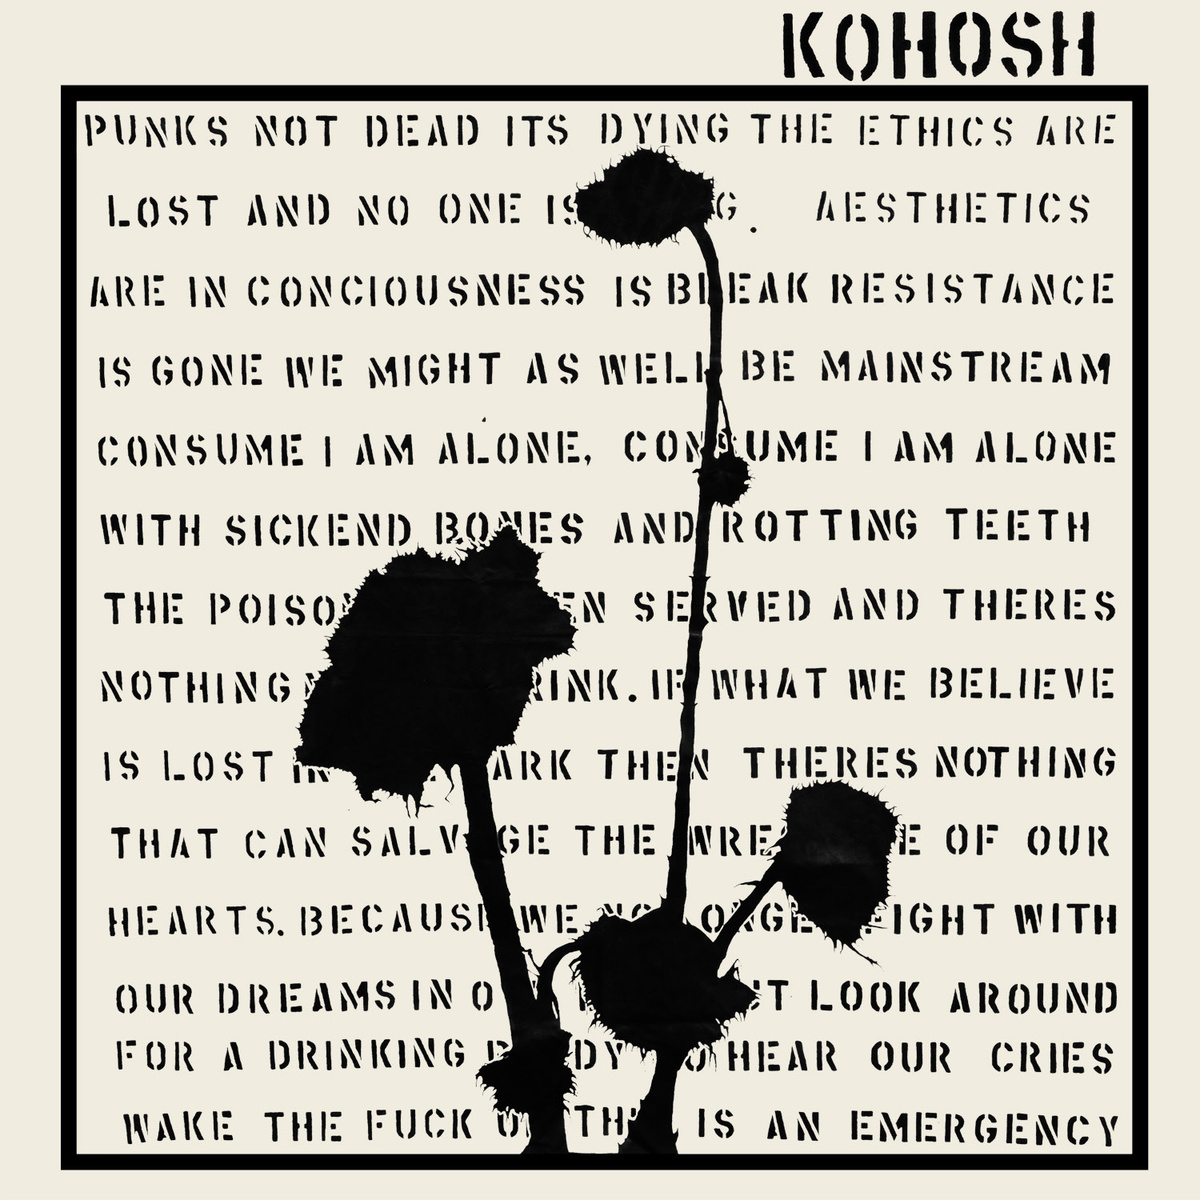 Kohosh Survival Guide